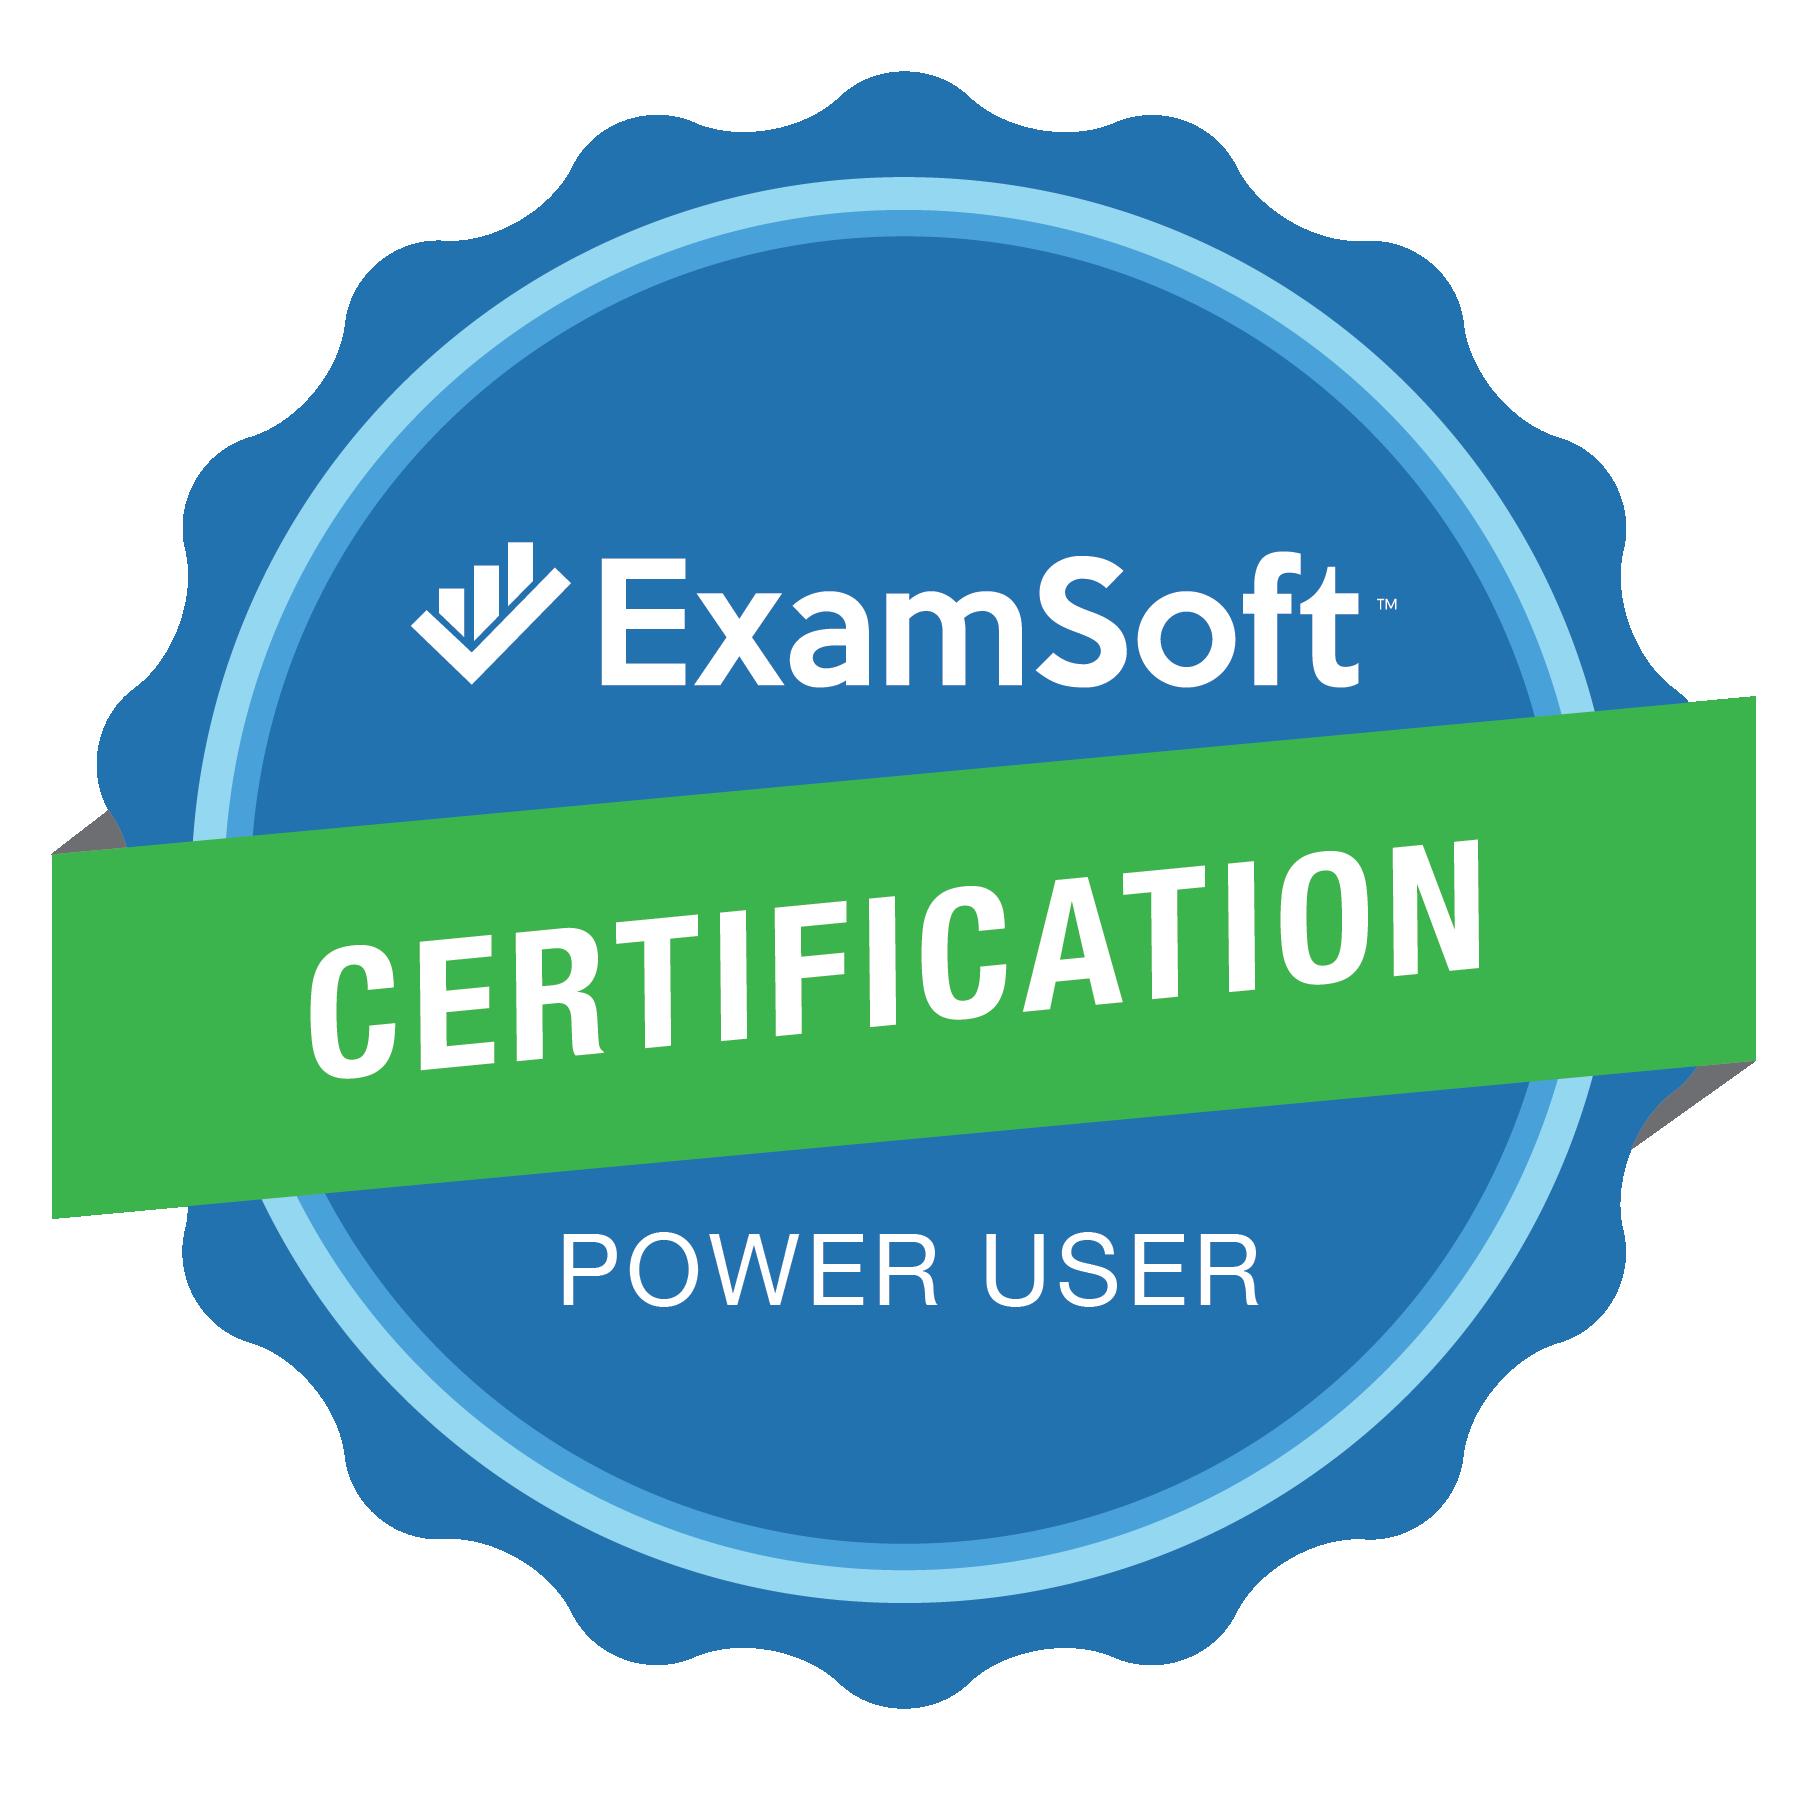 The ExamSoft Certification Power User Program Badge